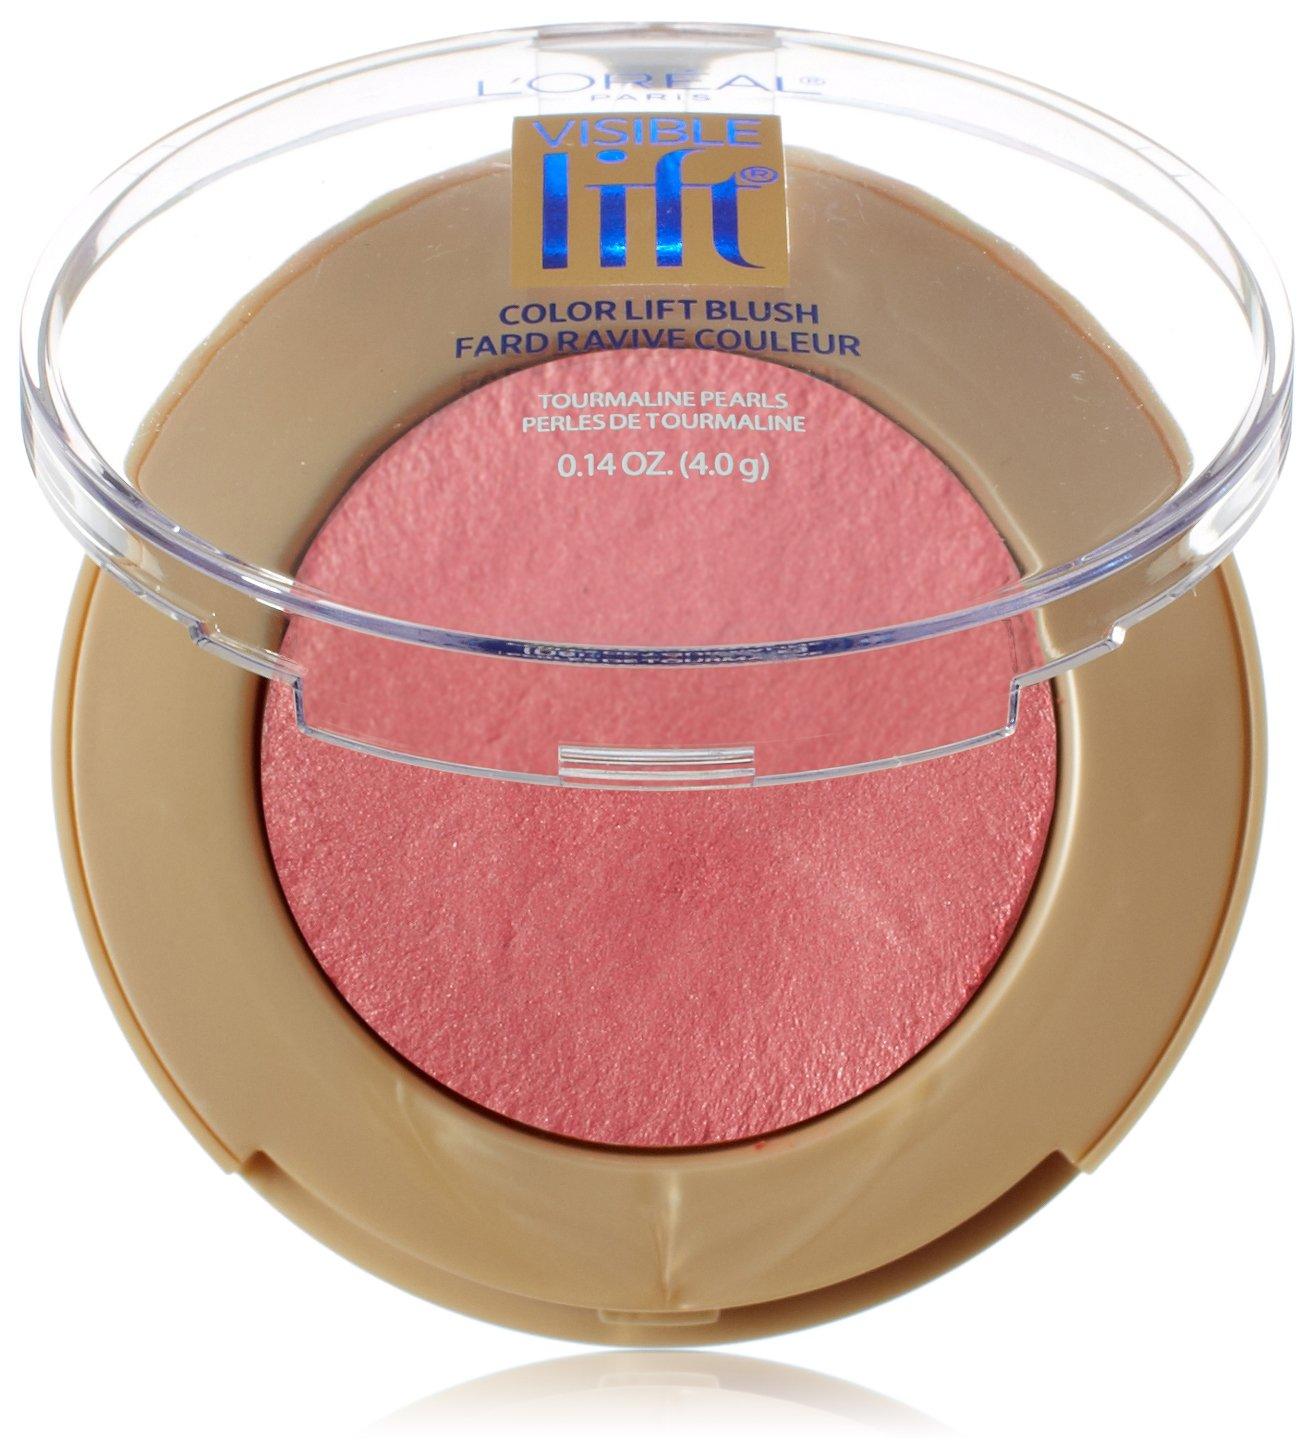 L'Oreal Paris Visible Lift Color Lift Blush, Pink Lift [703] 0.14 oz